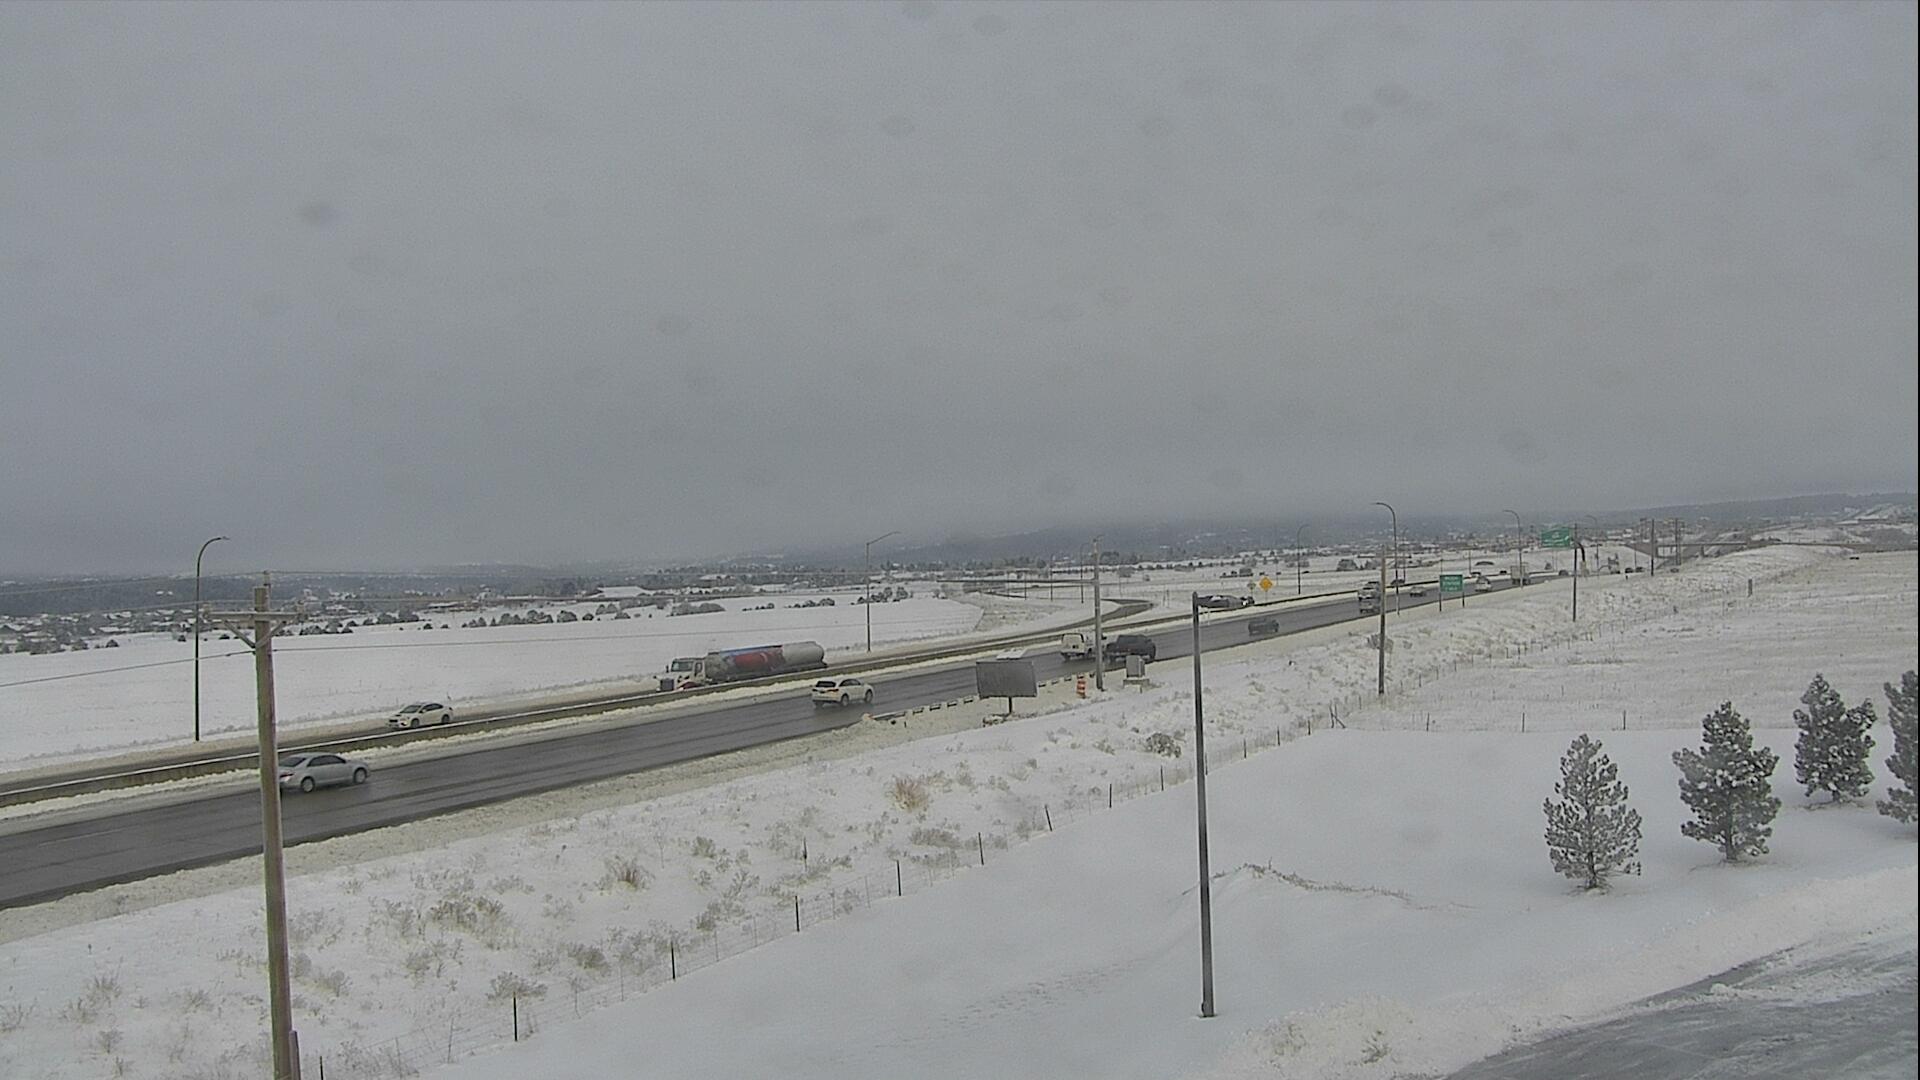 Interstate 25 in Monument around 7:45 a.m. Wednesday.